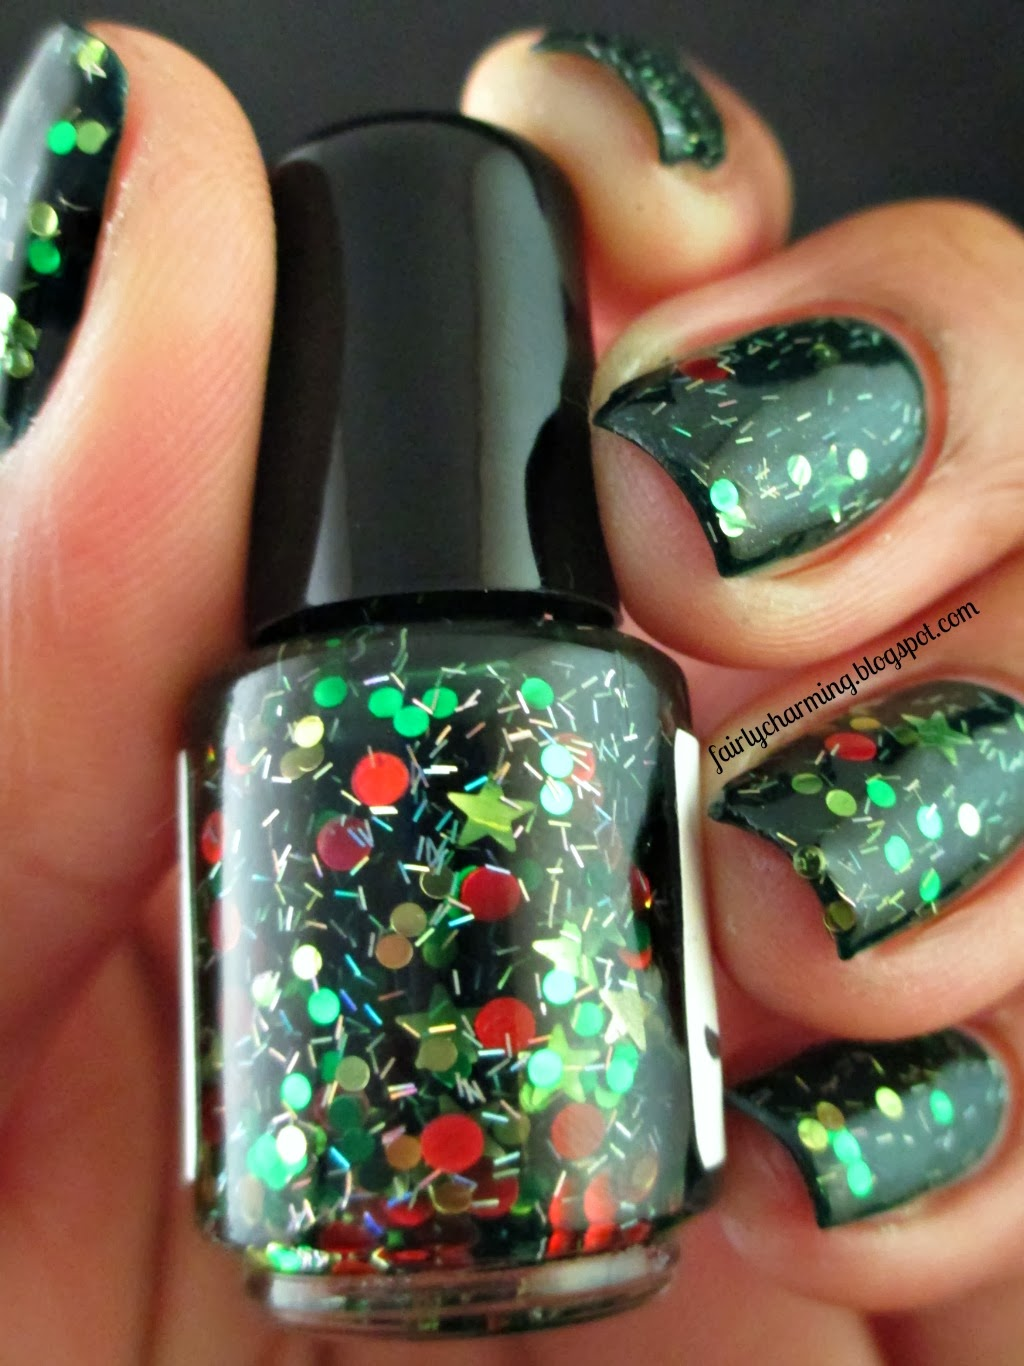 Fine Jelly Nail Polish Brands Vignette - Nail Art Ideas - morihati.com